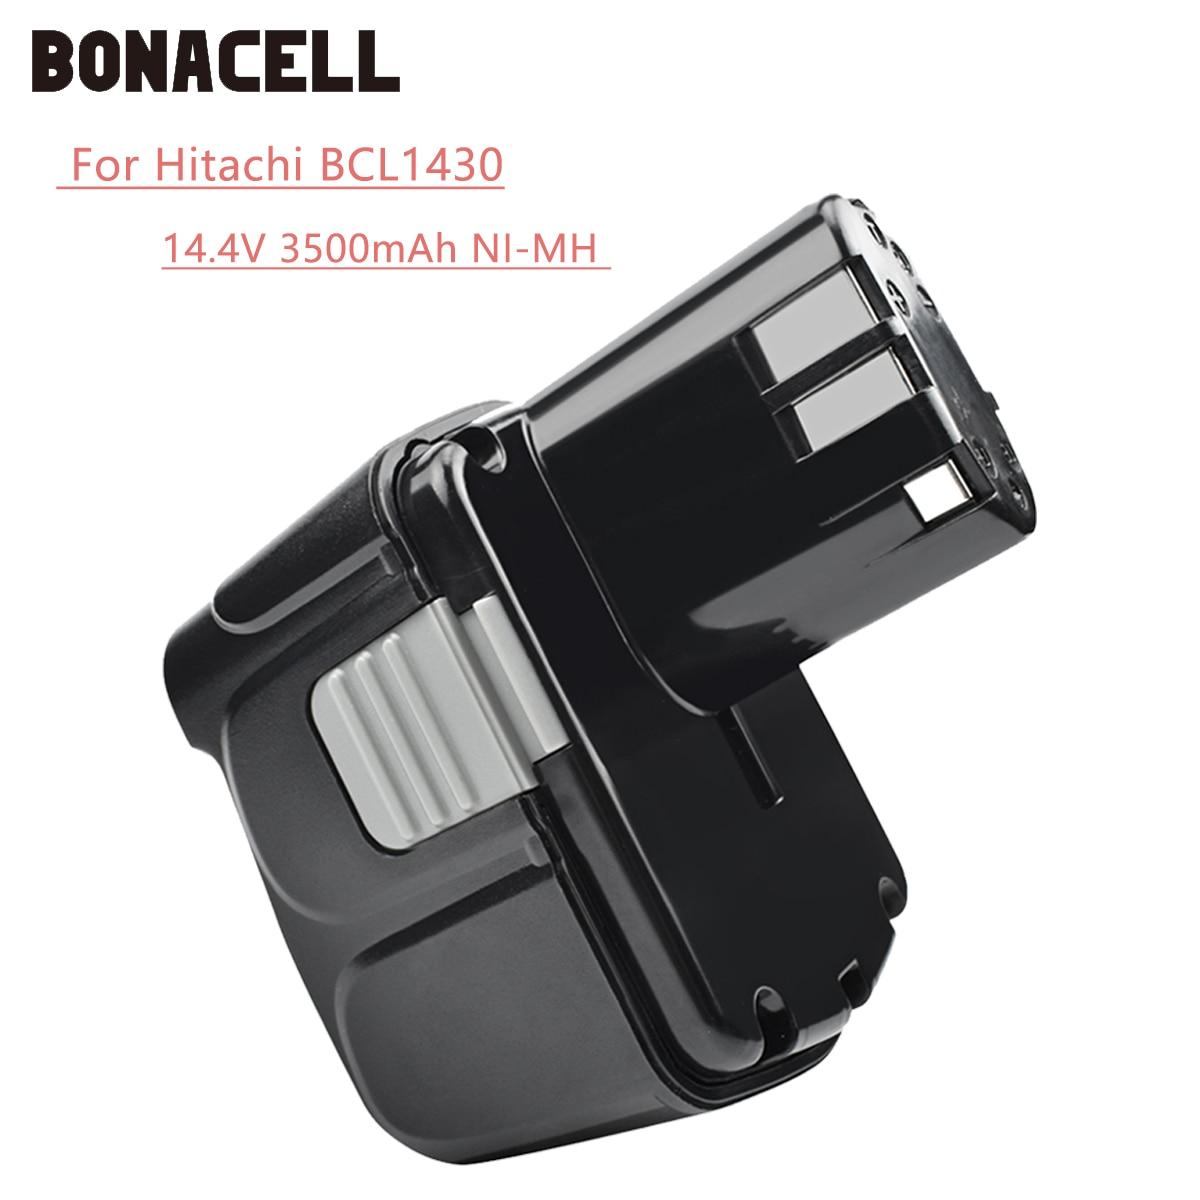 Bonacell 14.4V 3500mAh For Hitachi BCL1430 Battery For Hitachi CJ14DL DH14DL EBL1430 BCL1430 BCL1415 Li-ion Battery L30